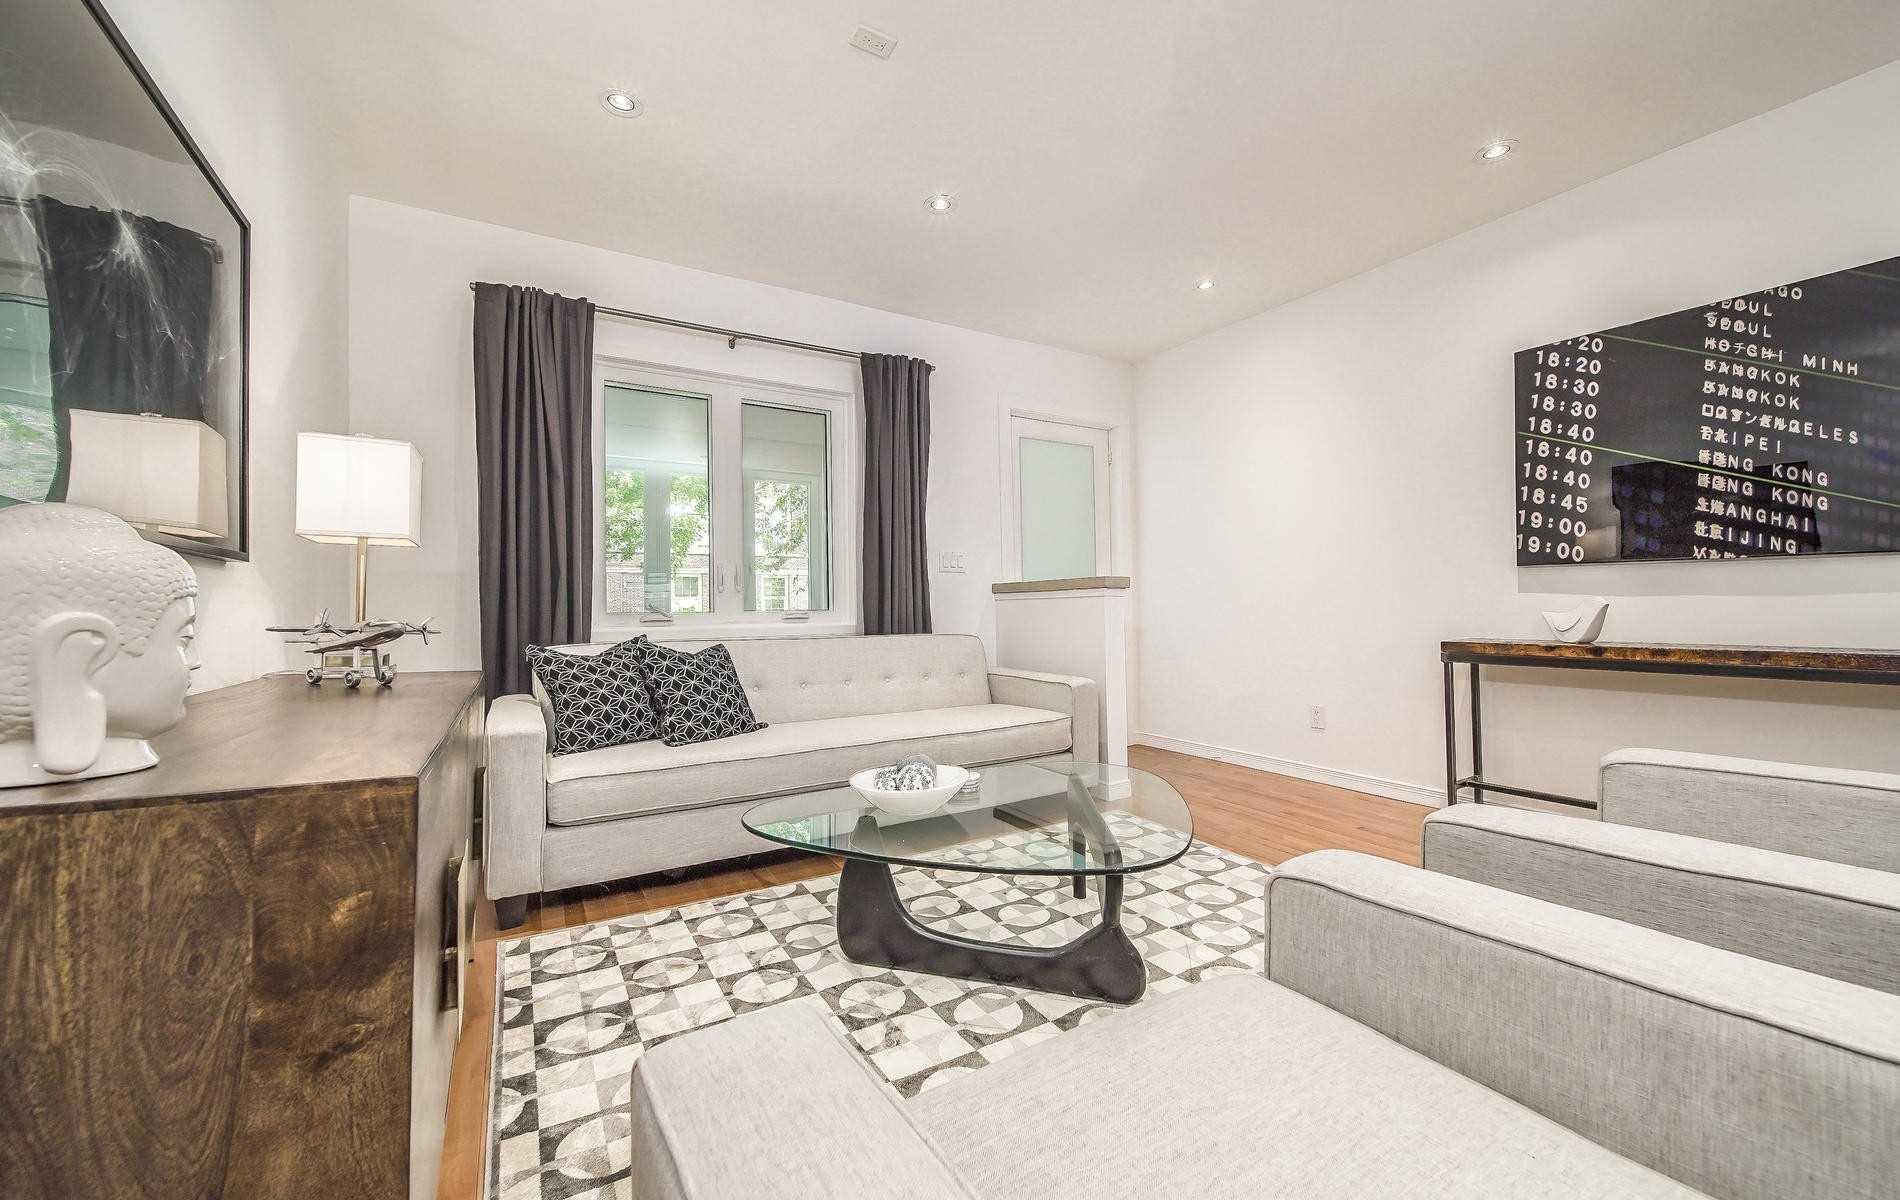 Photo 4: Photos: 64 Larchmount Avenue in Toronto: South Riverdale House (2-Storey) for sale (Toronto E01)  : MLS®# E4489752